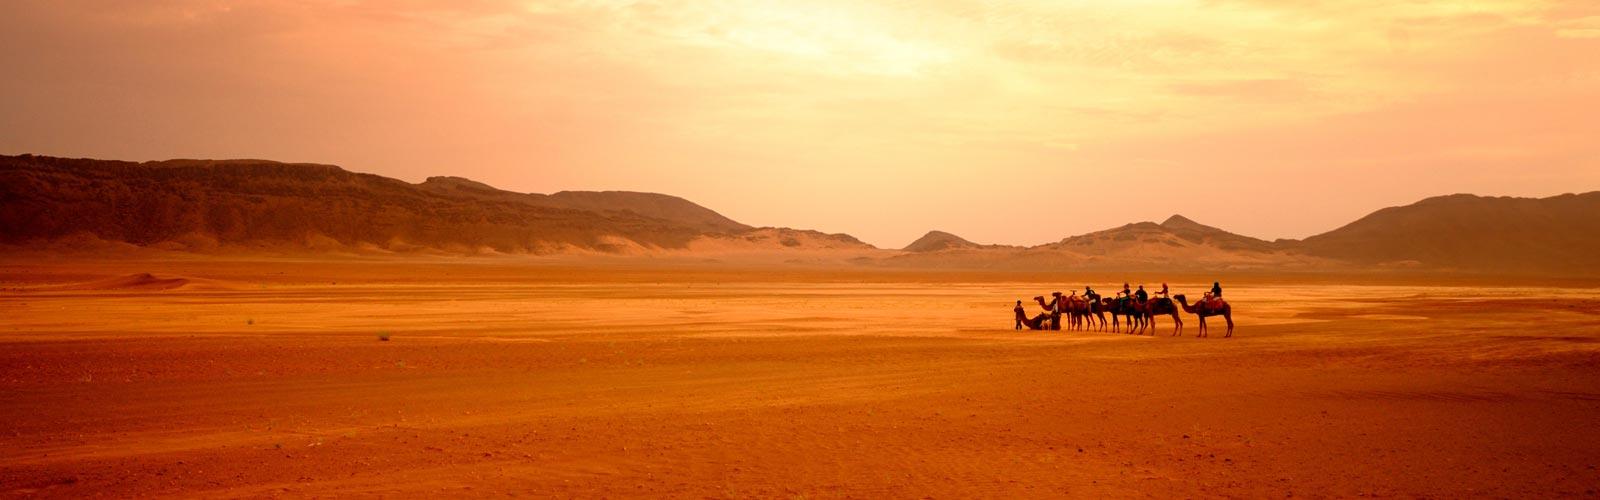 Marruecos Reyes Magos. 27 Dic.